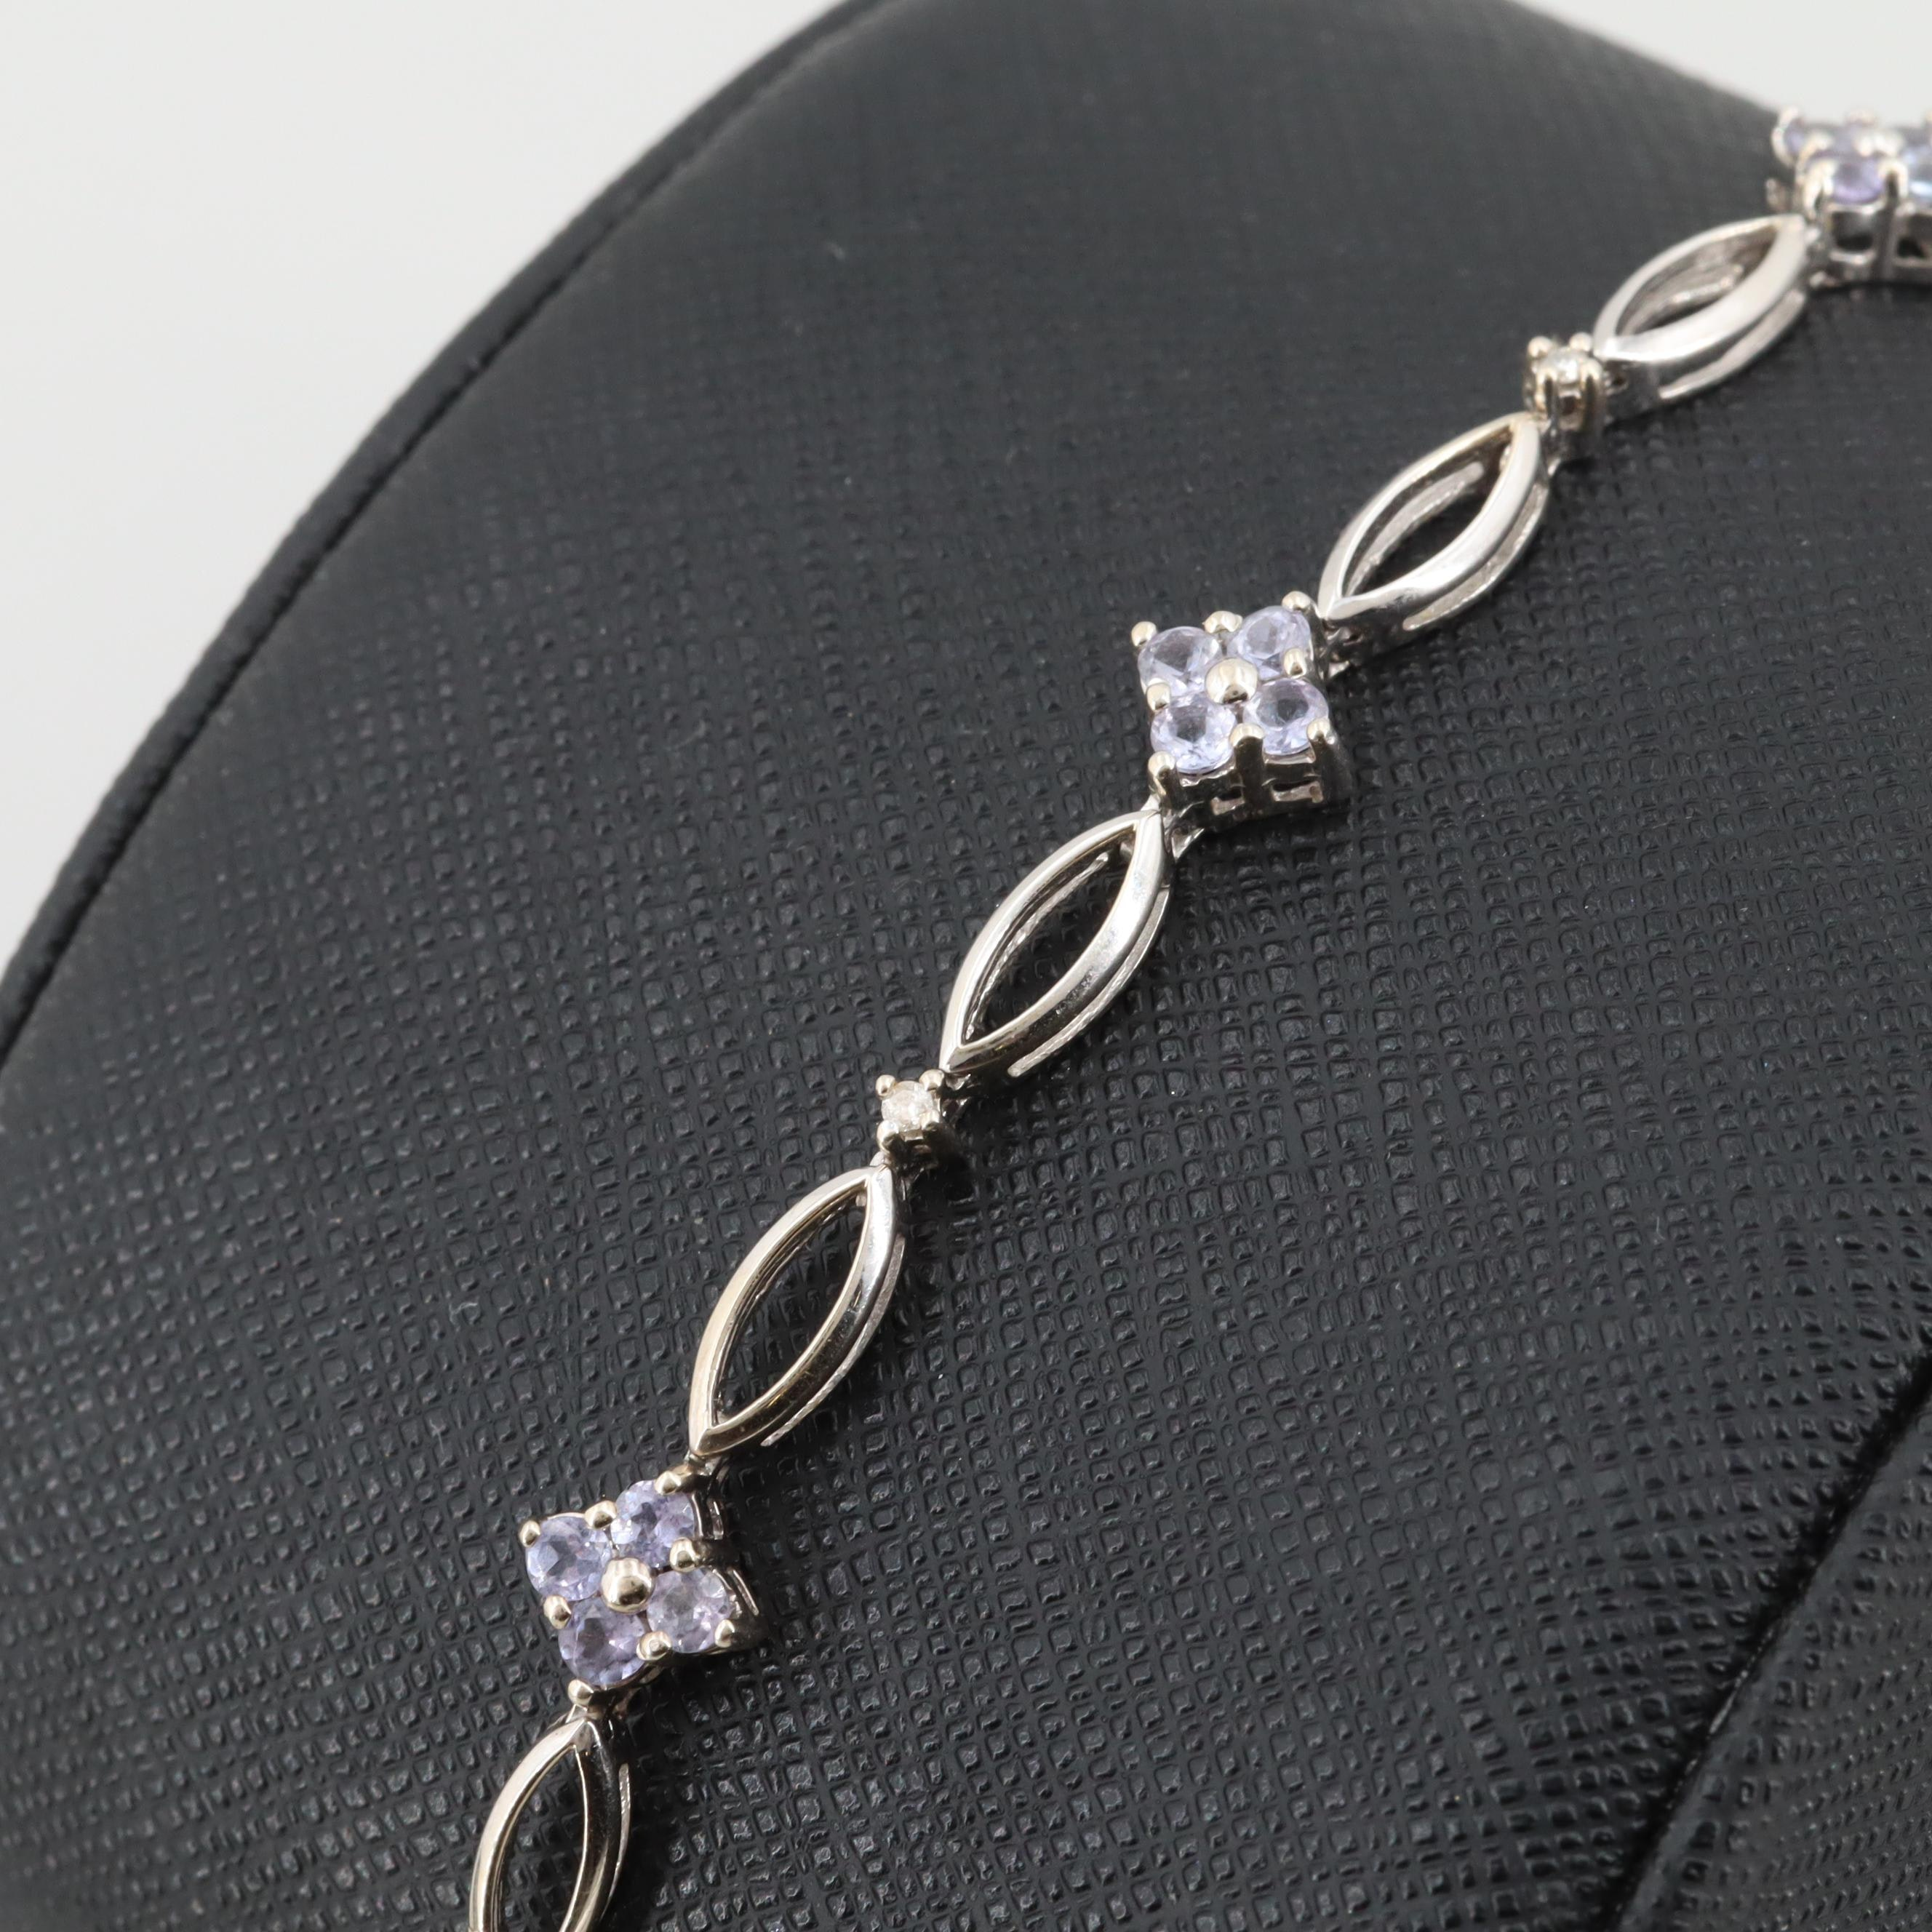 14K White Gold Tanzanite and Diamond Bracelet